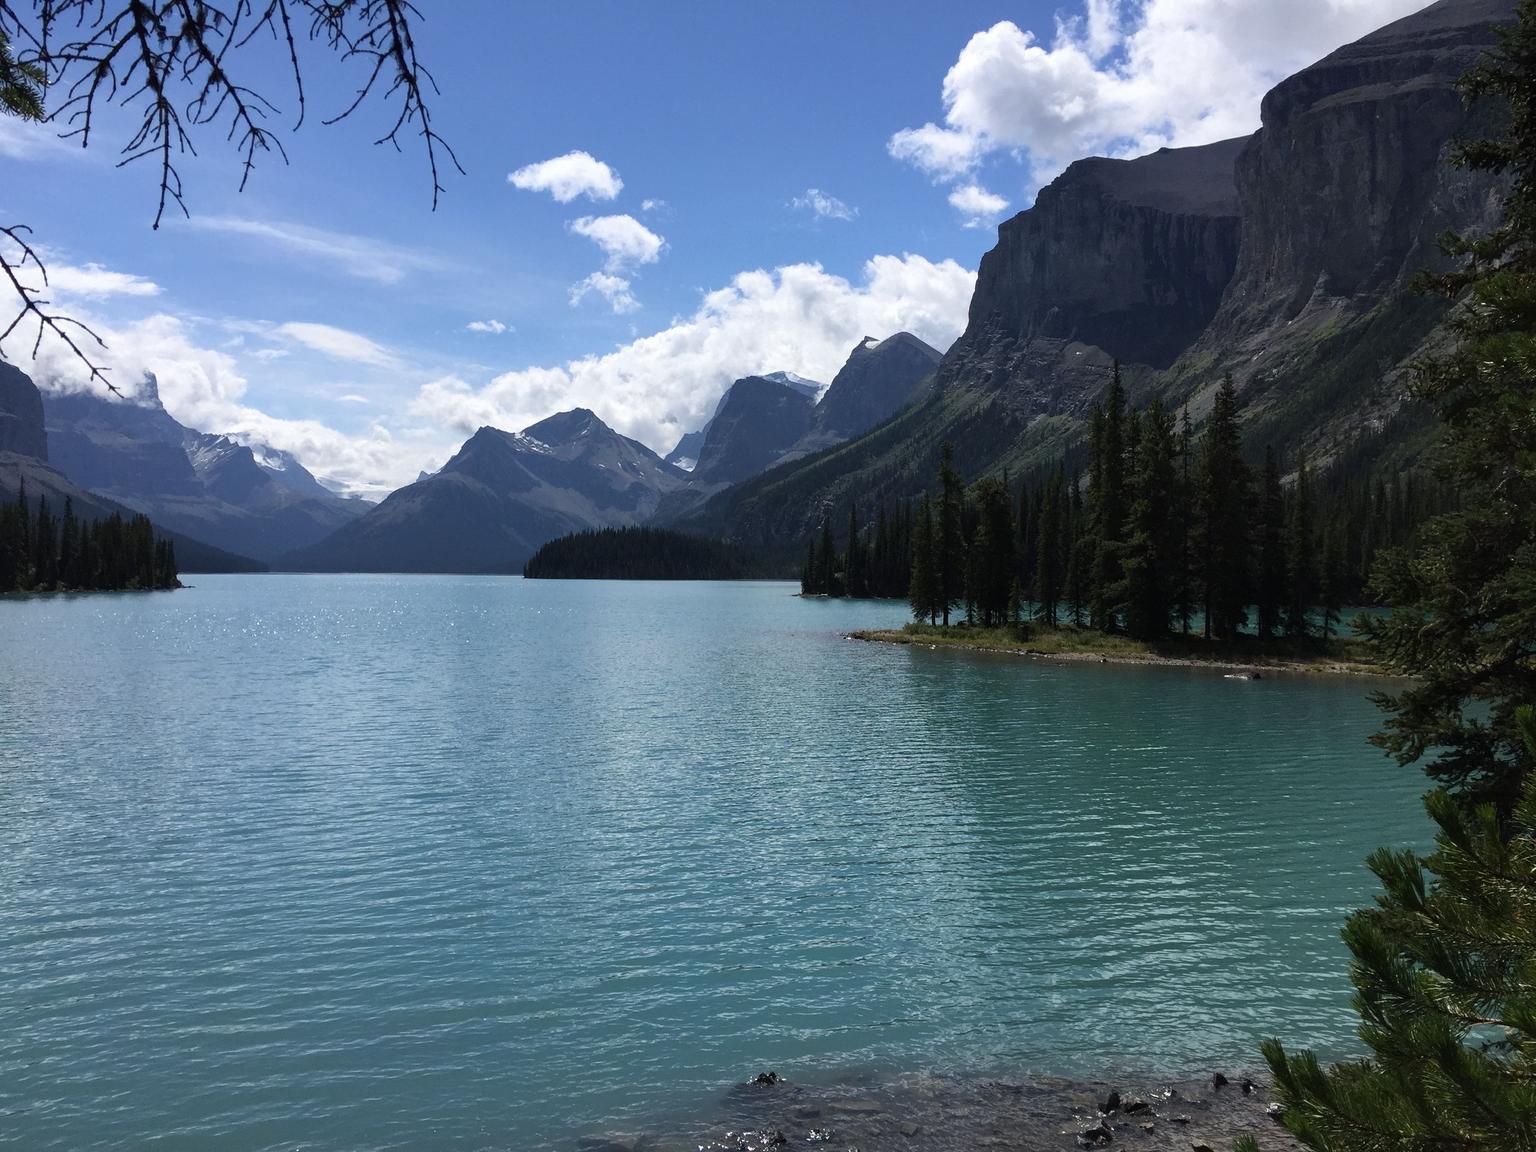 MORE PHOTOS, Jasper City Sightseeing Tour and Maligne Lake Cruise